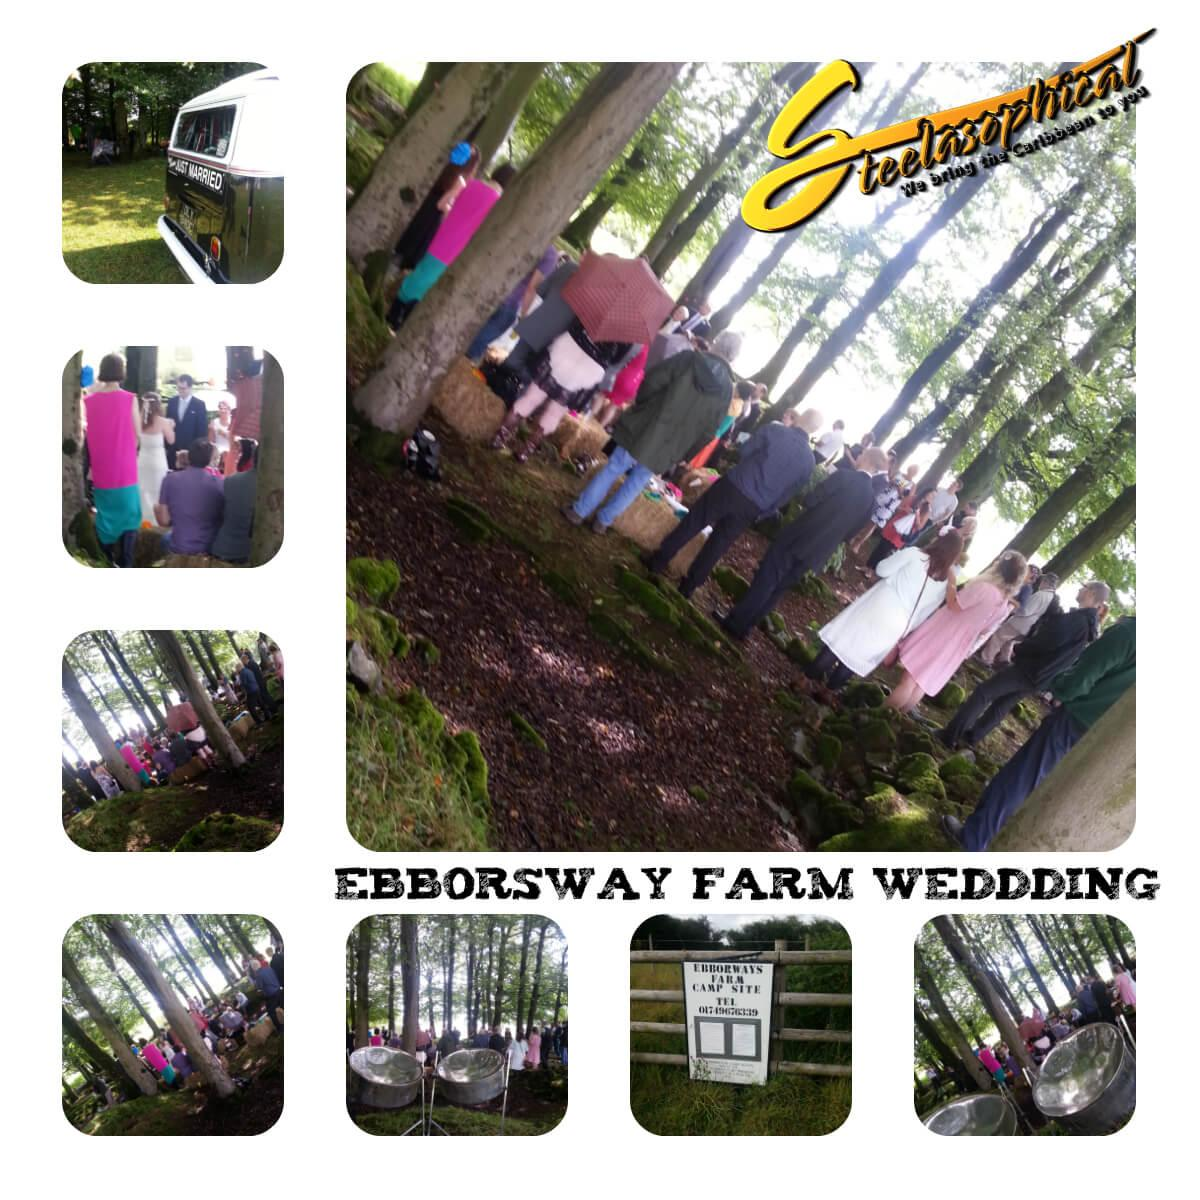 Steelband steelpan steeldrums steelasophical music hire uk Ebborsway Farm Wedding